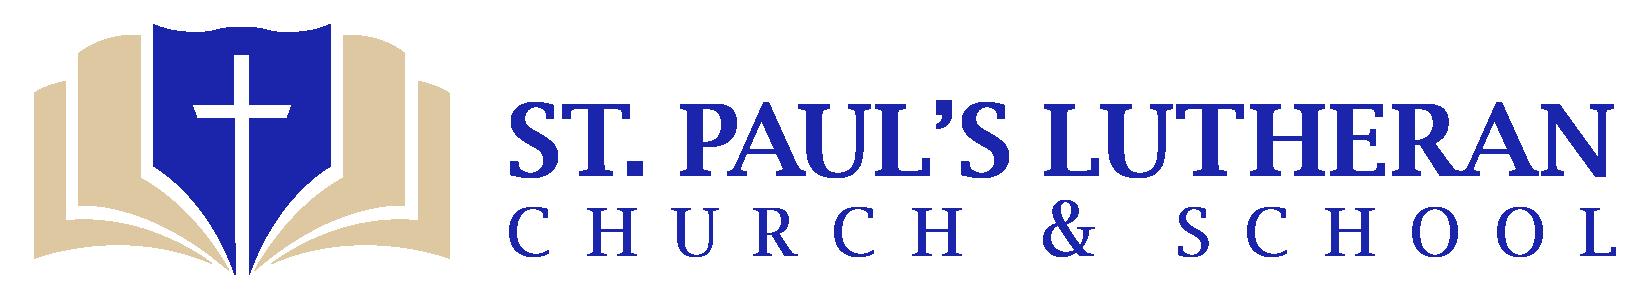 St. Paul's Lutheran Truman